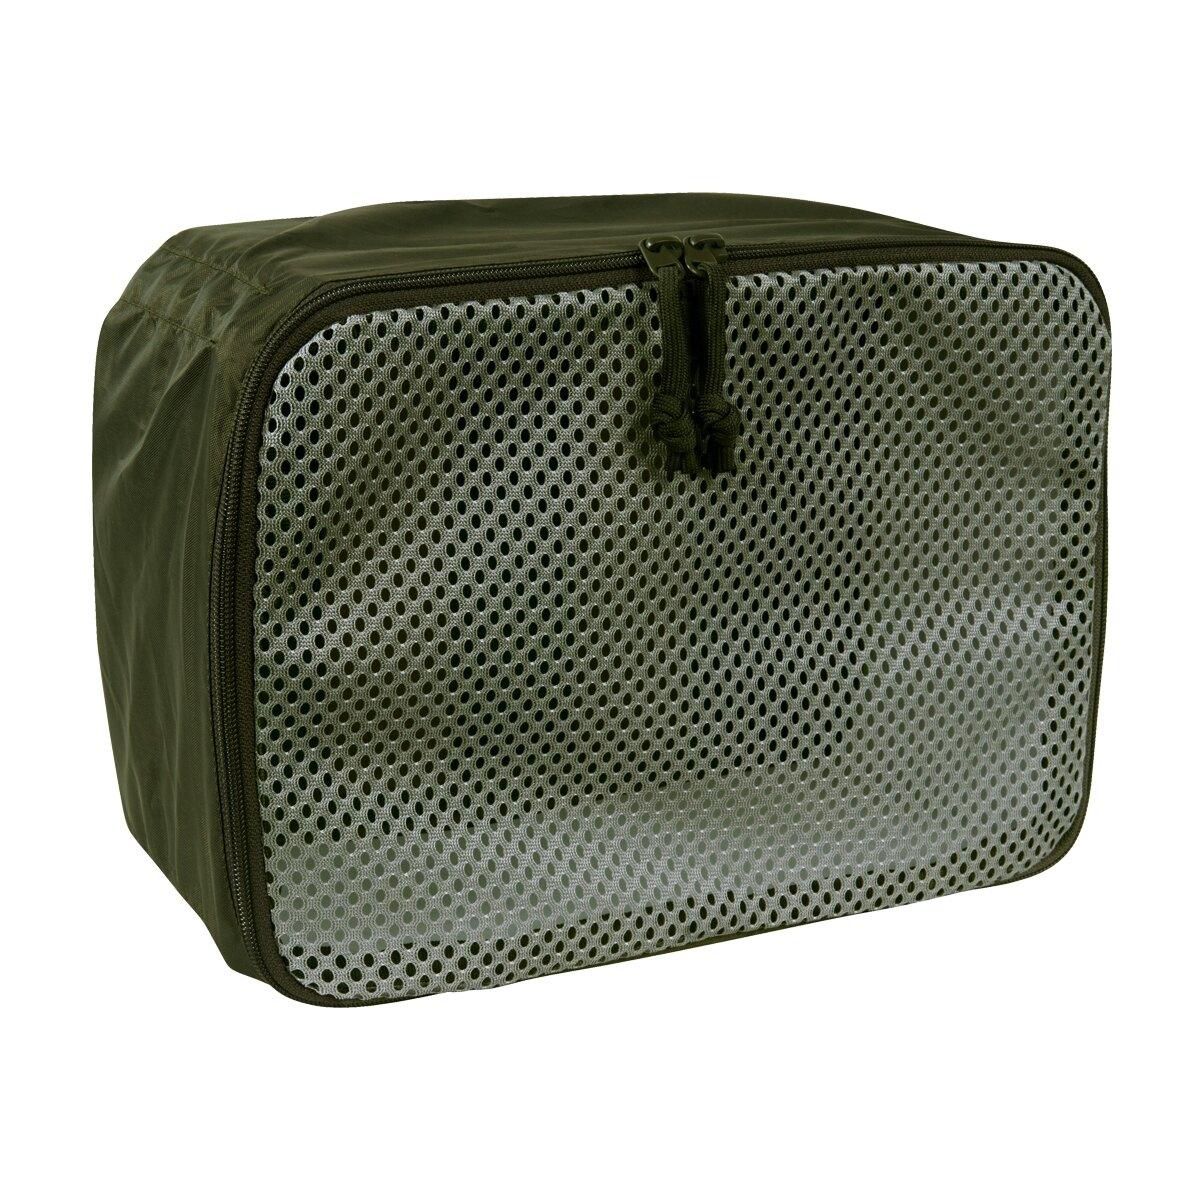 Levně Sada velcro pouzder Tasmanian Tiger® Modular Pouch – Olive Green (Barva: Olive Green)